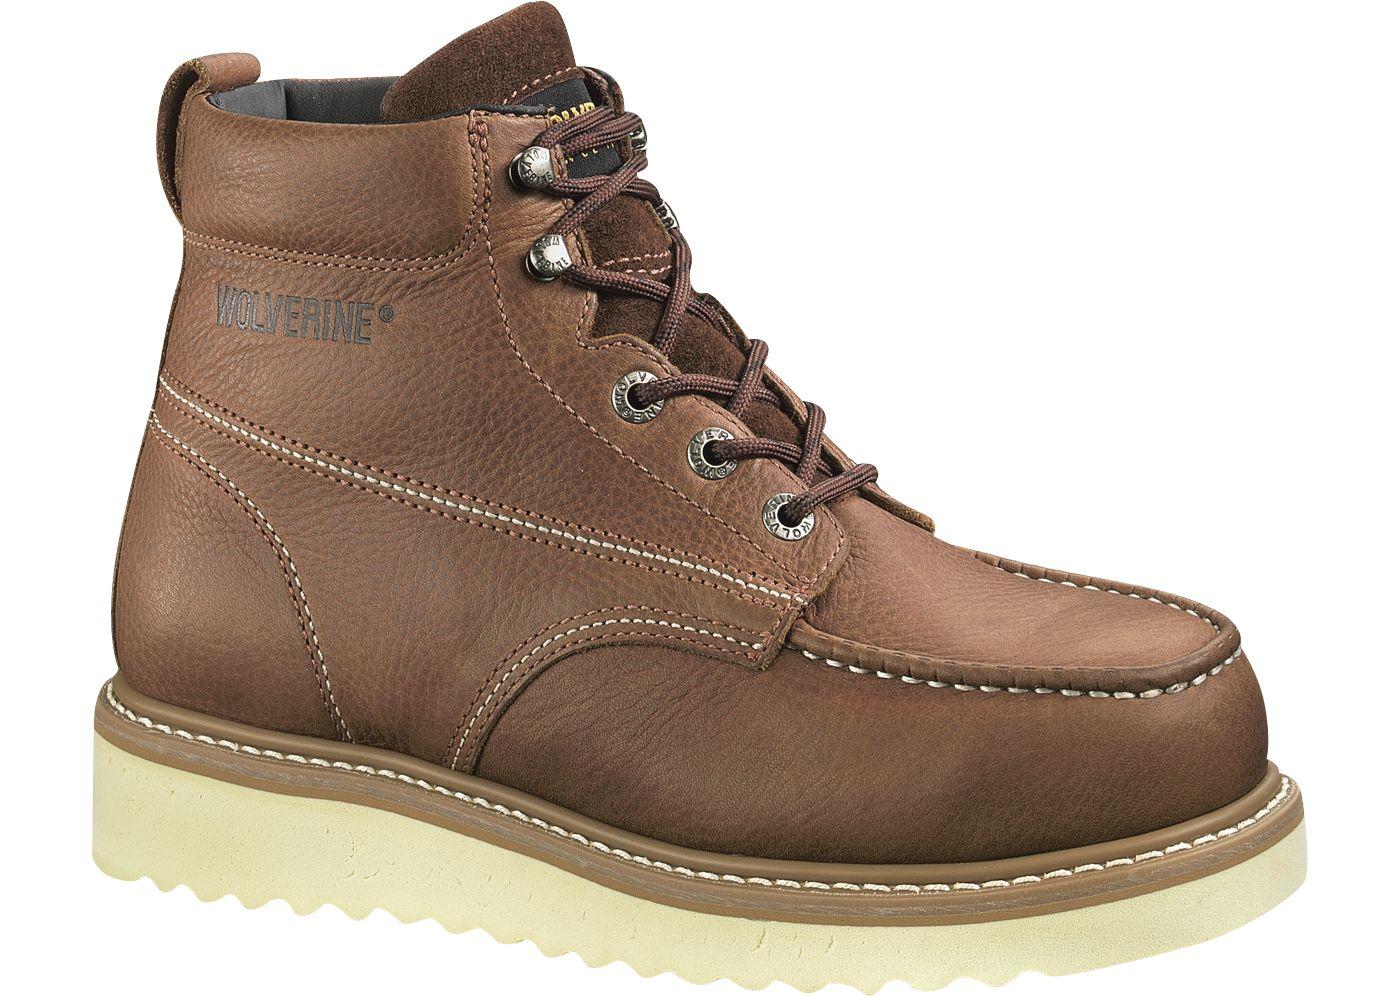 "Wolverine Men's Moc Toe Wedge 6"" Work Boots"